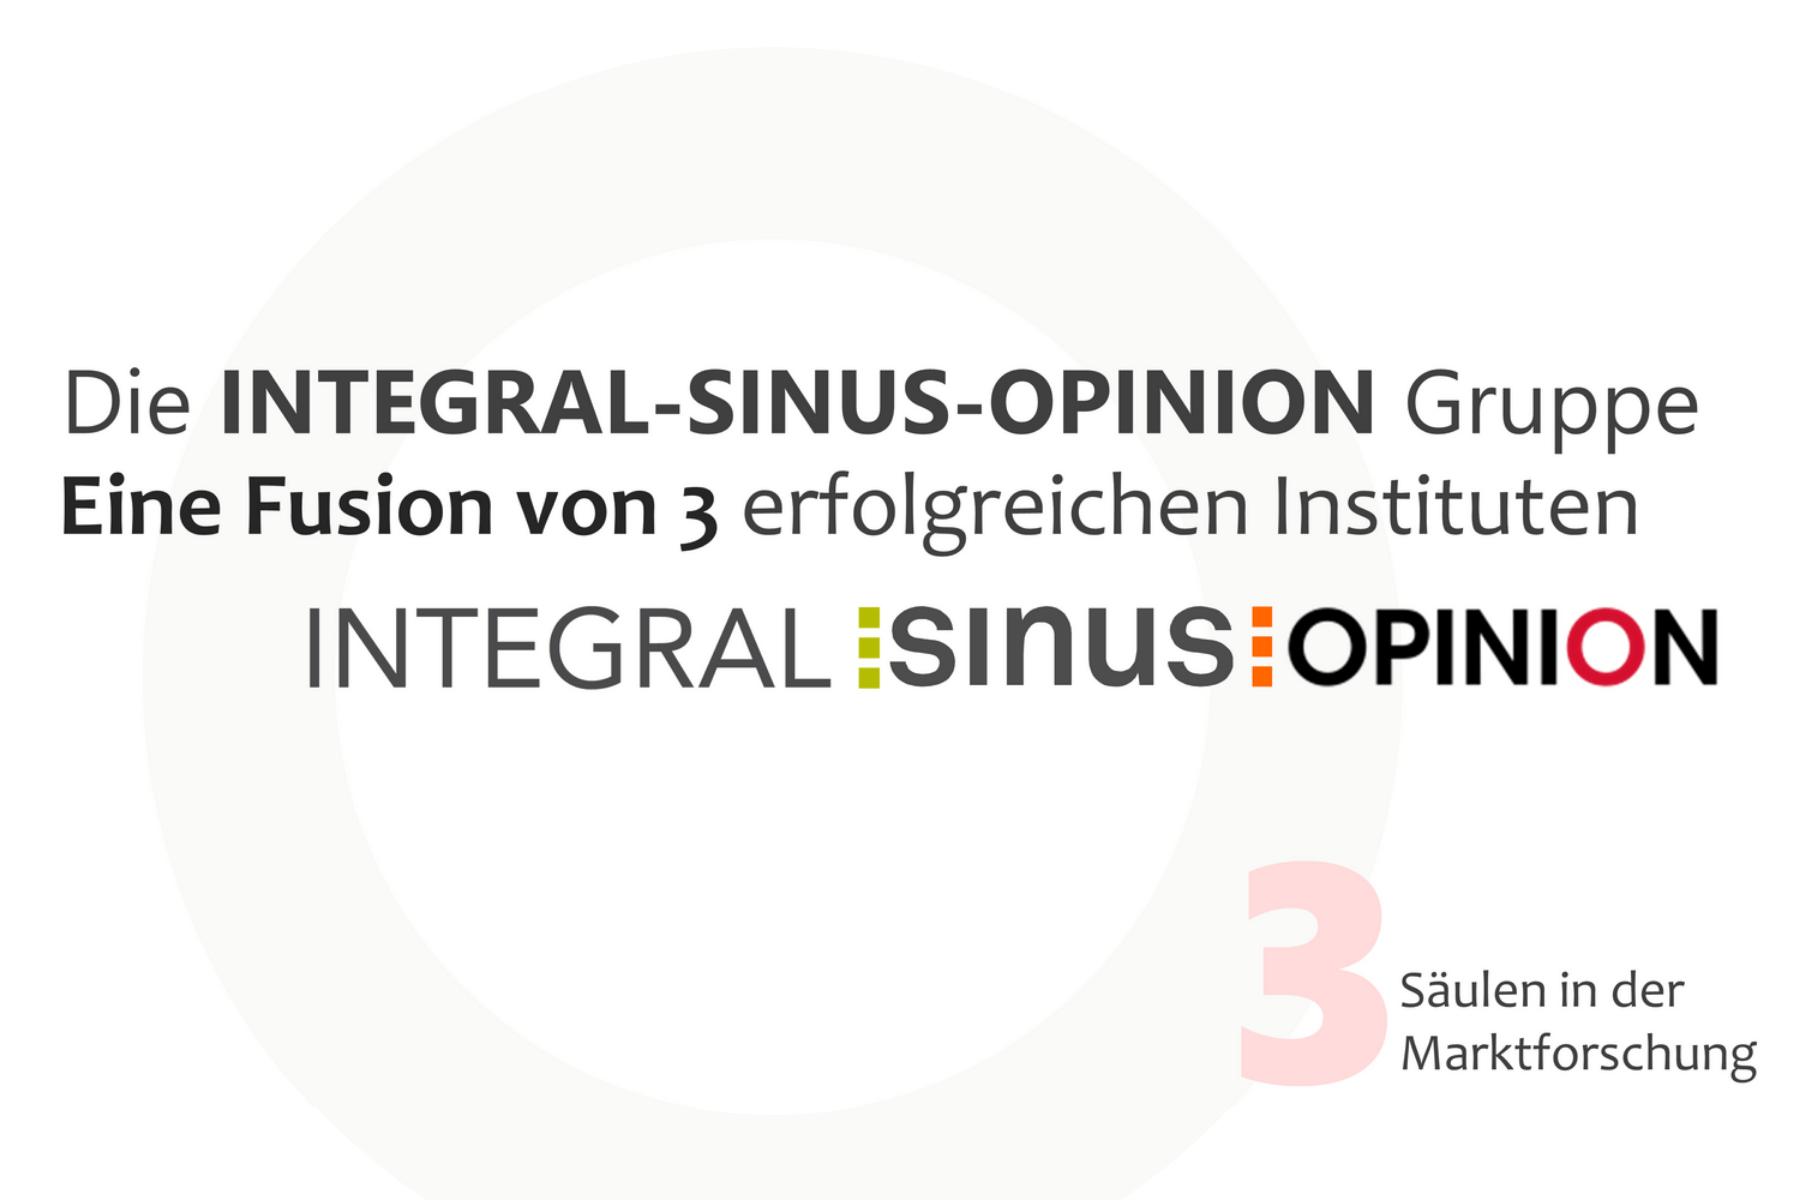 INTEGRAL + SINUS + OPINION